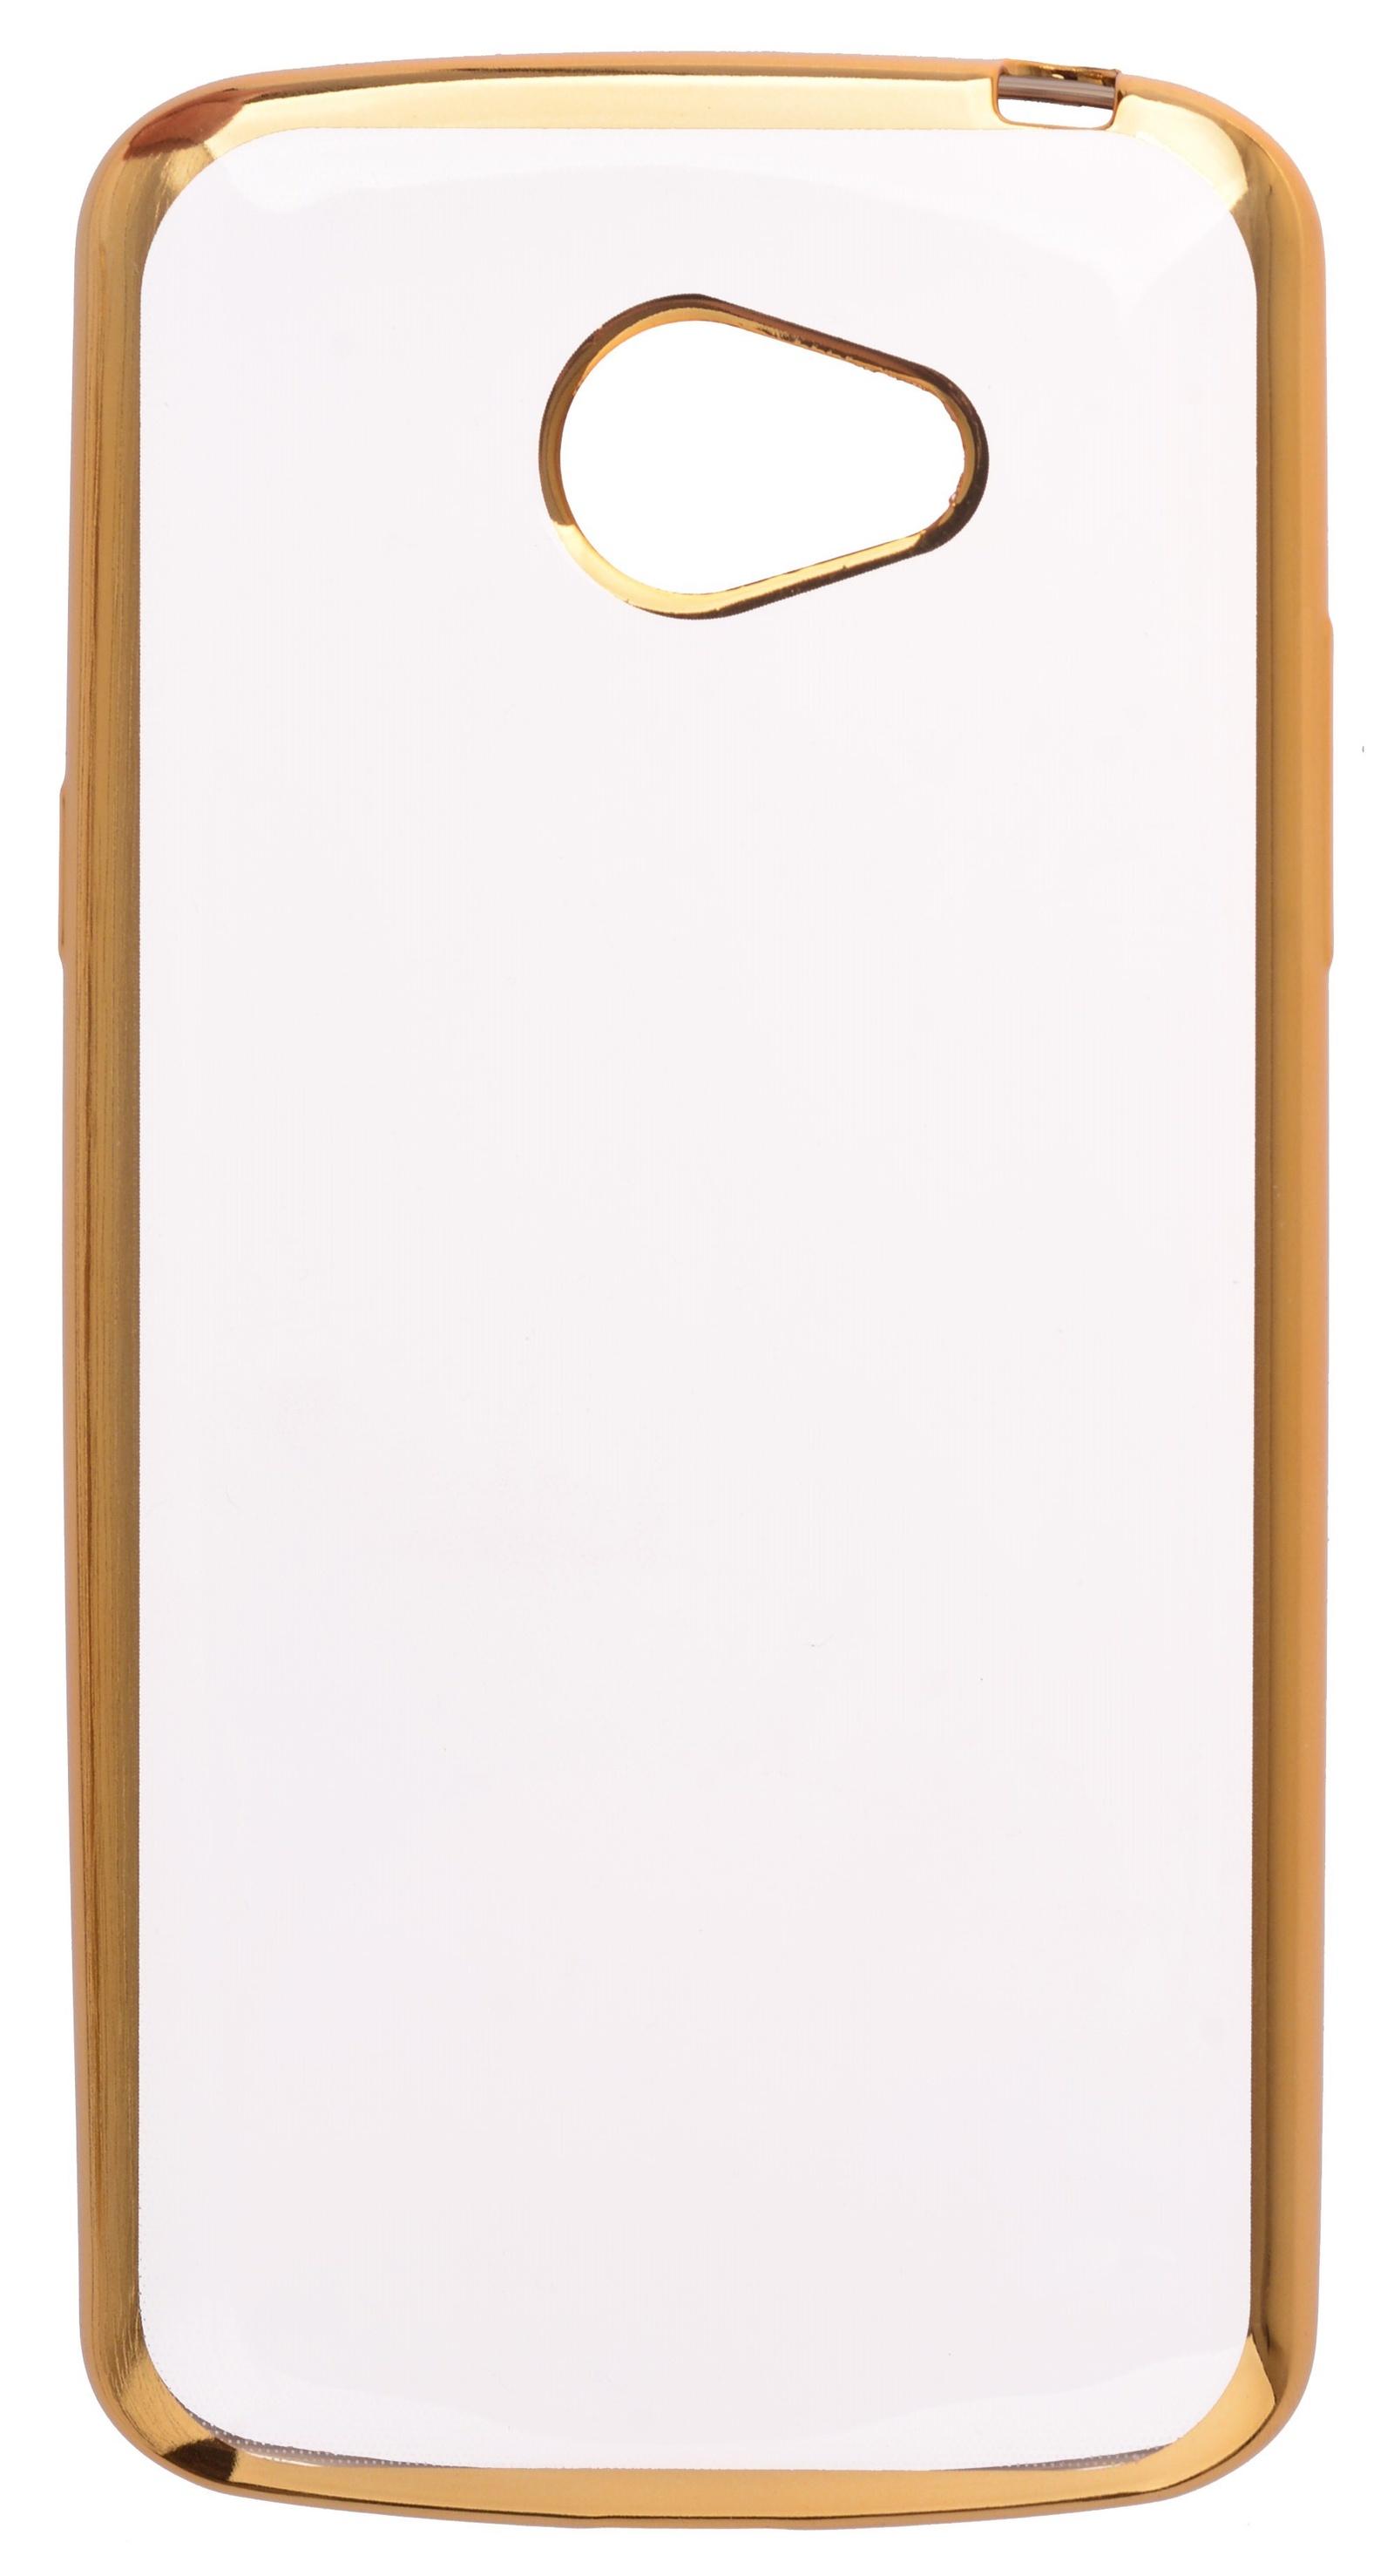 Чехол для сотового телефона skinBOX Silicone chrome border, 4630042529298, золотой аксессуар чехол накладка innovation silicone 0 33mm для apple iphone 5 5s transparent 12001